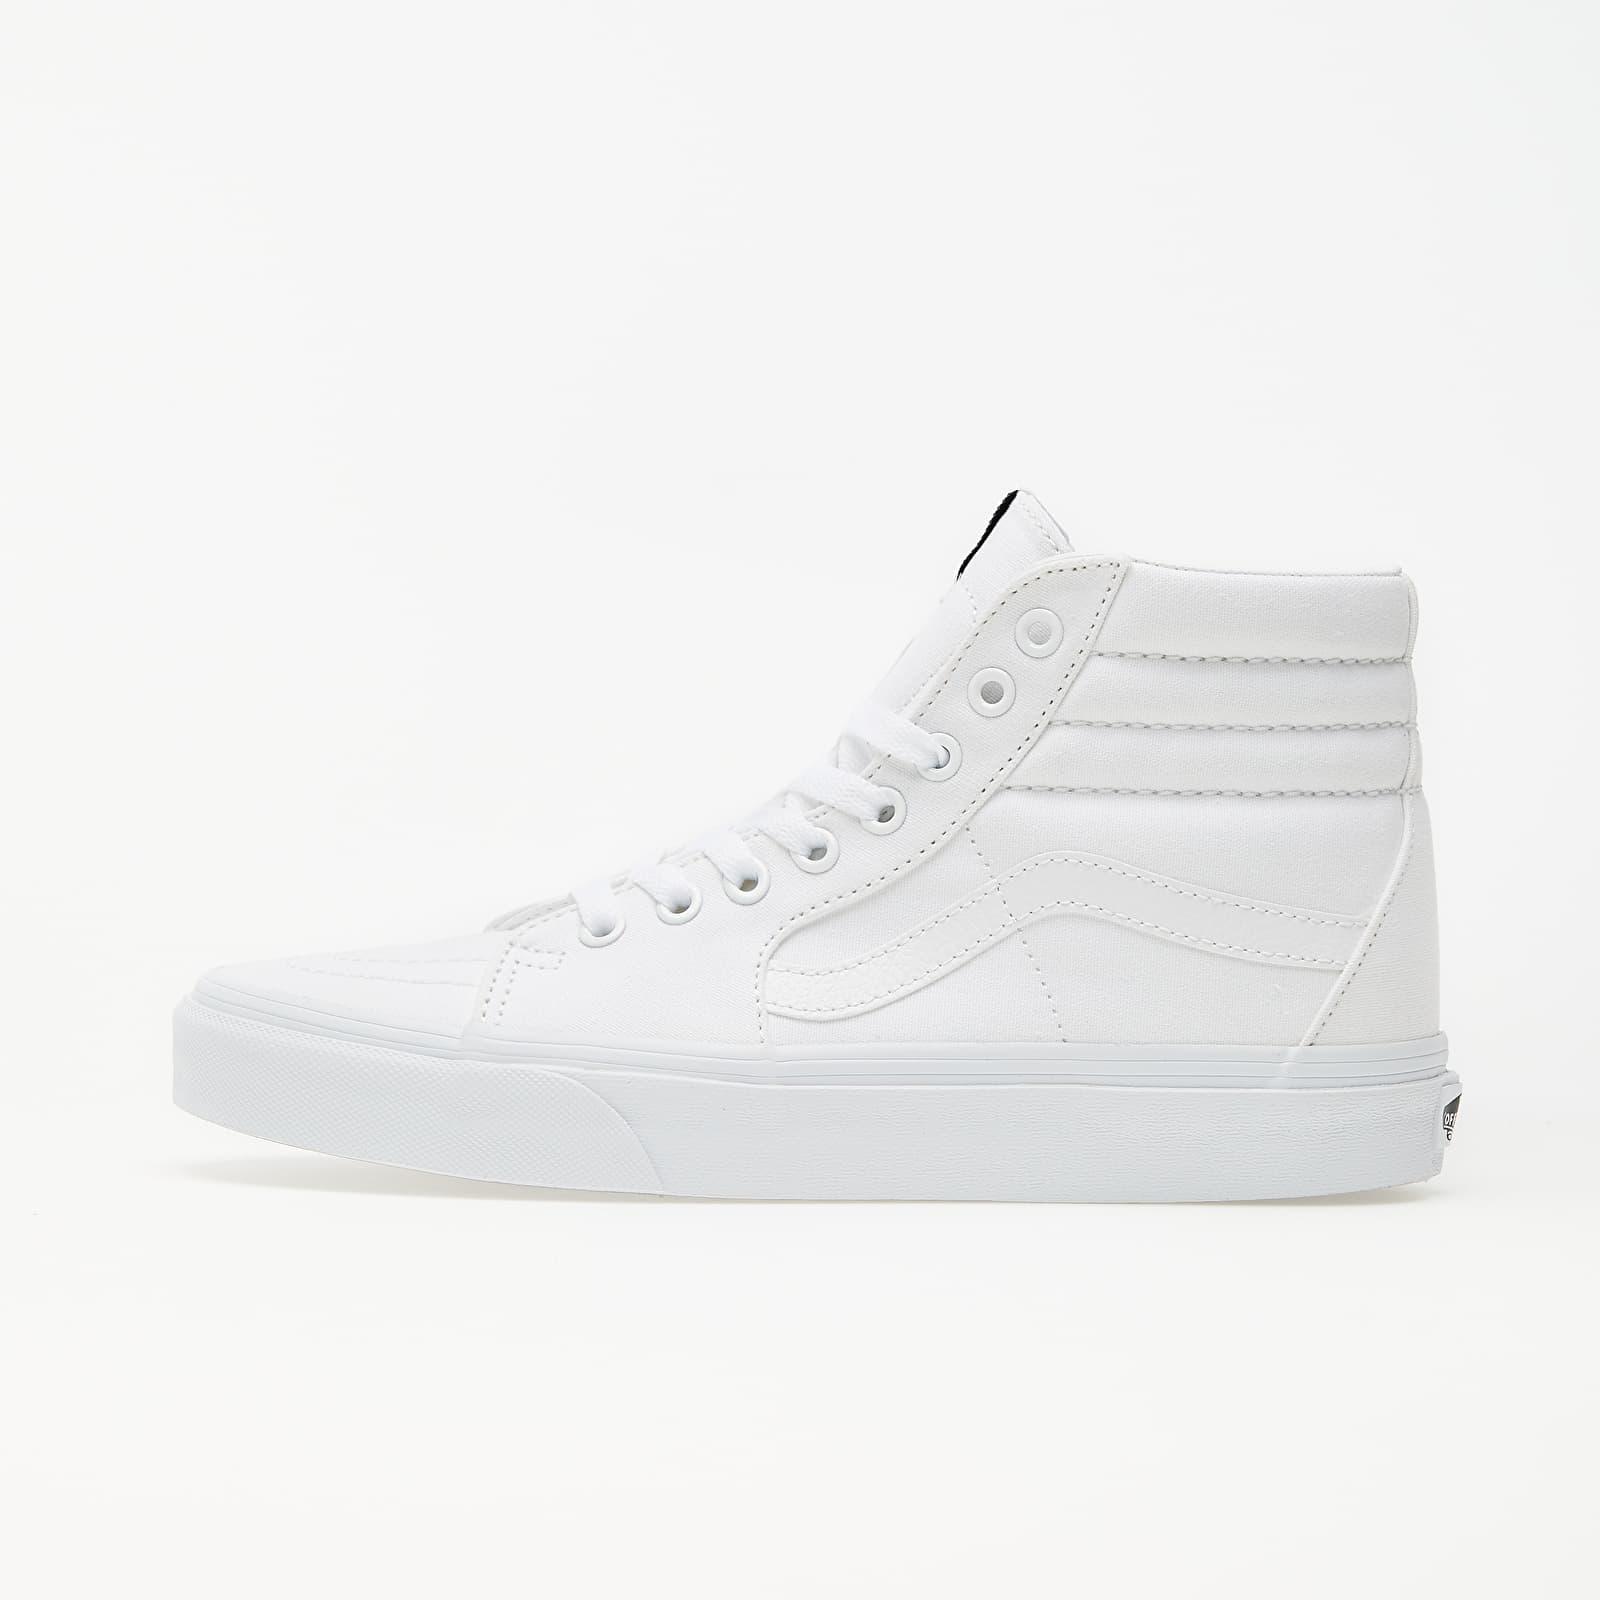 Pánské tenisky a boty Vans Sk8-Hi True White